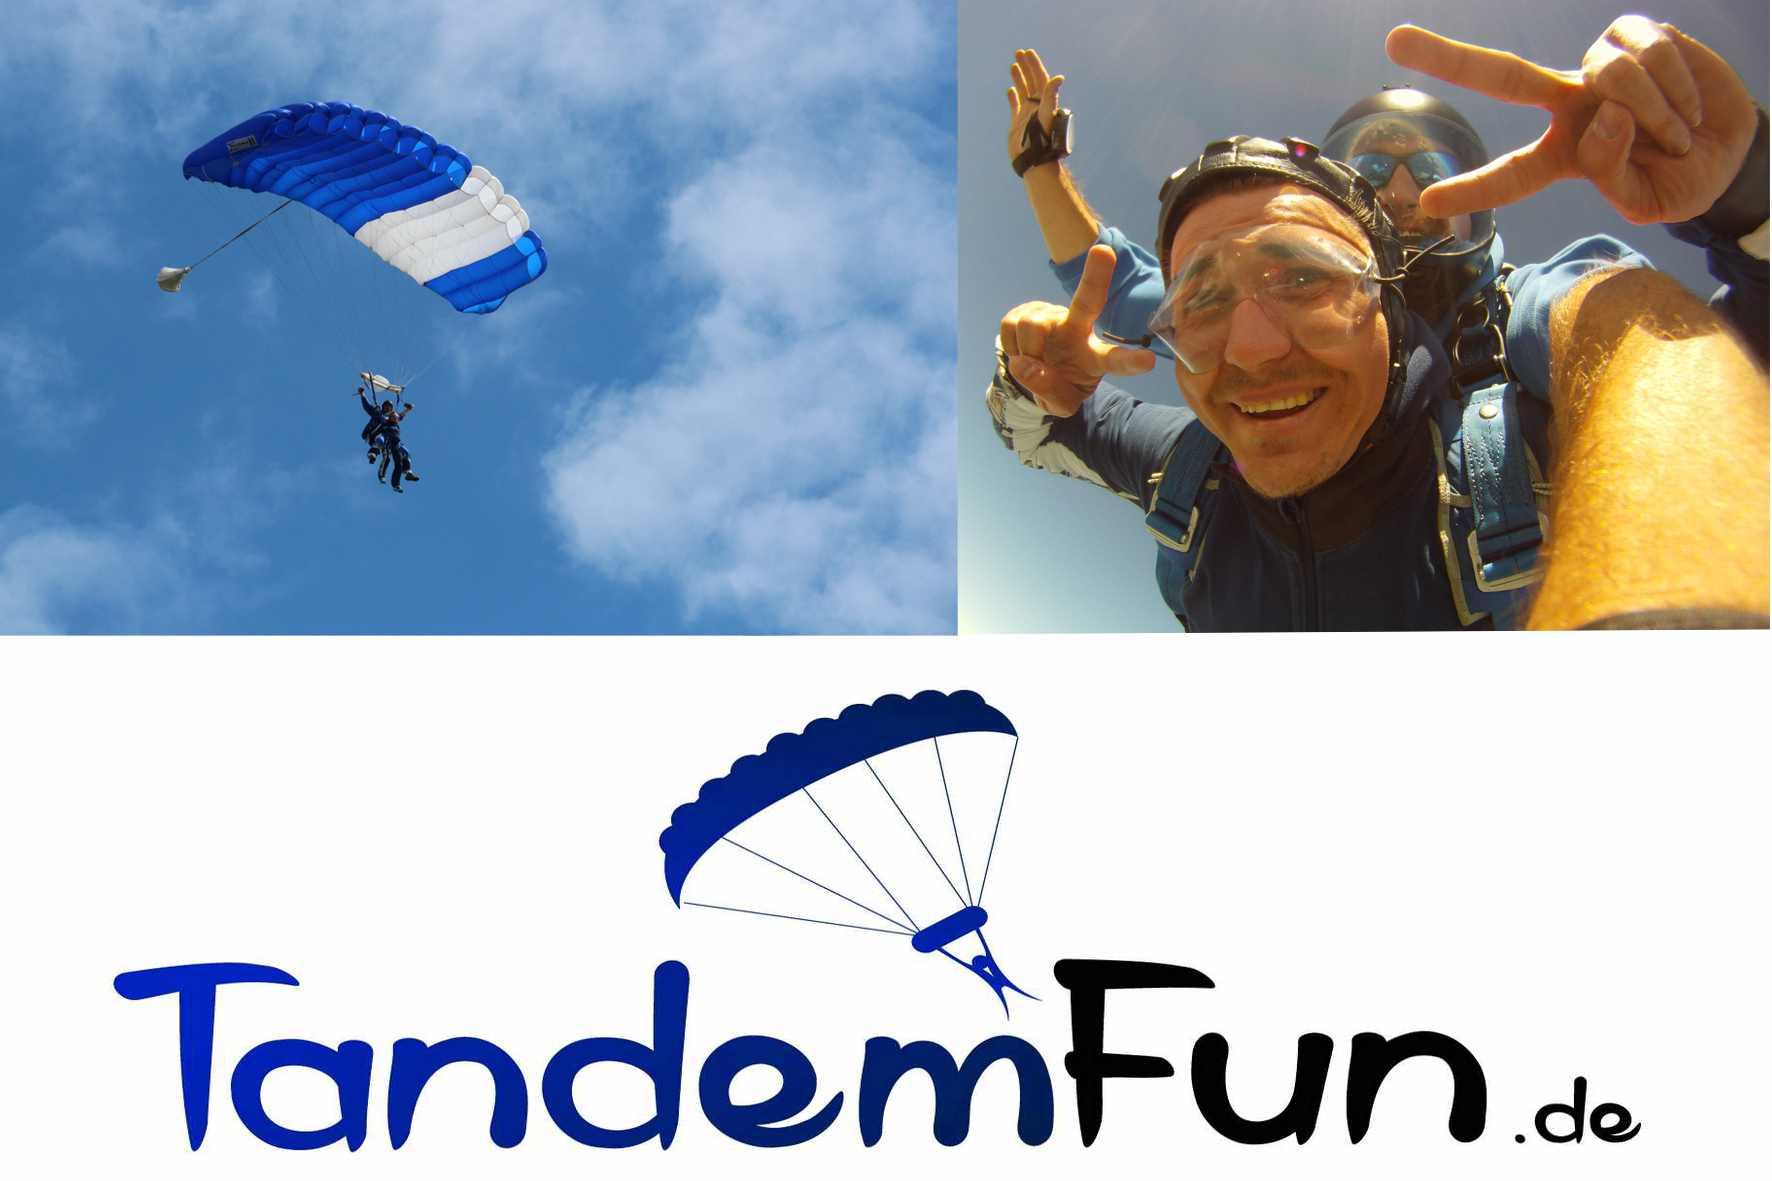 tandemfun-de-Fallschirm-springen